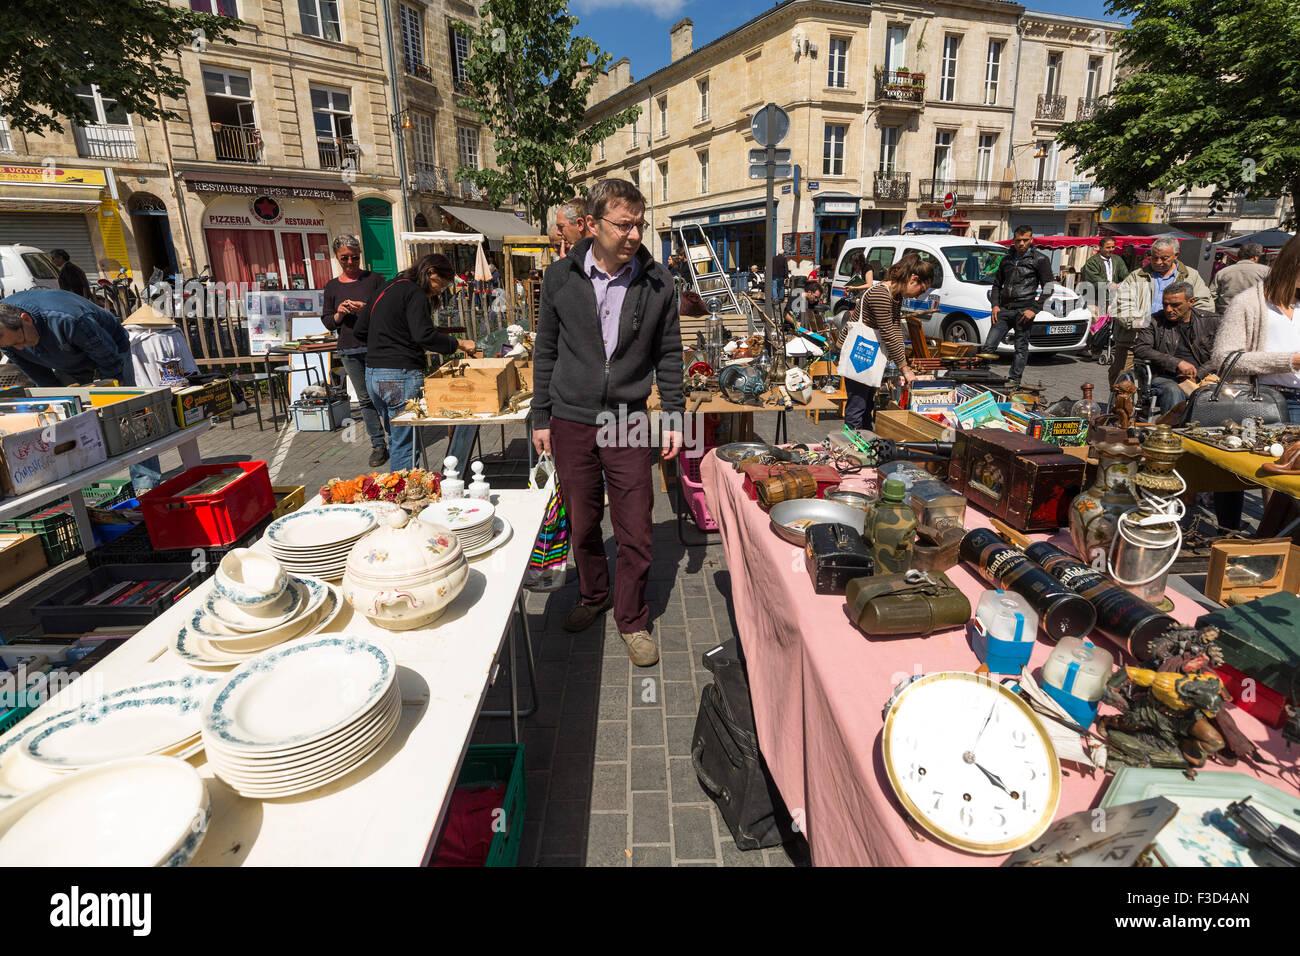 Place Meynard street market Bordeaux Gironde Aquitaine France Europe Photo Stock